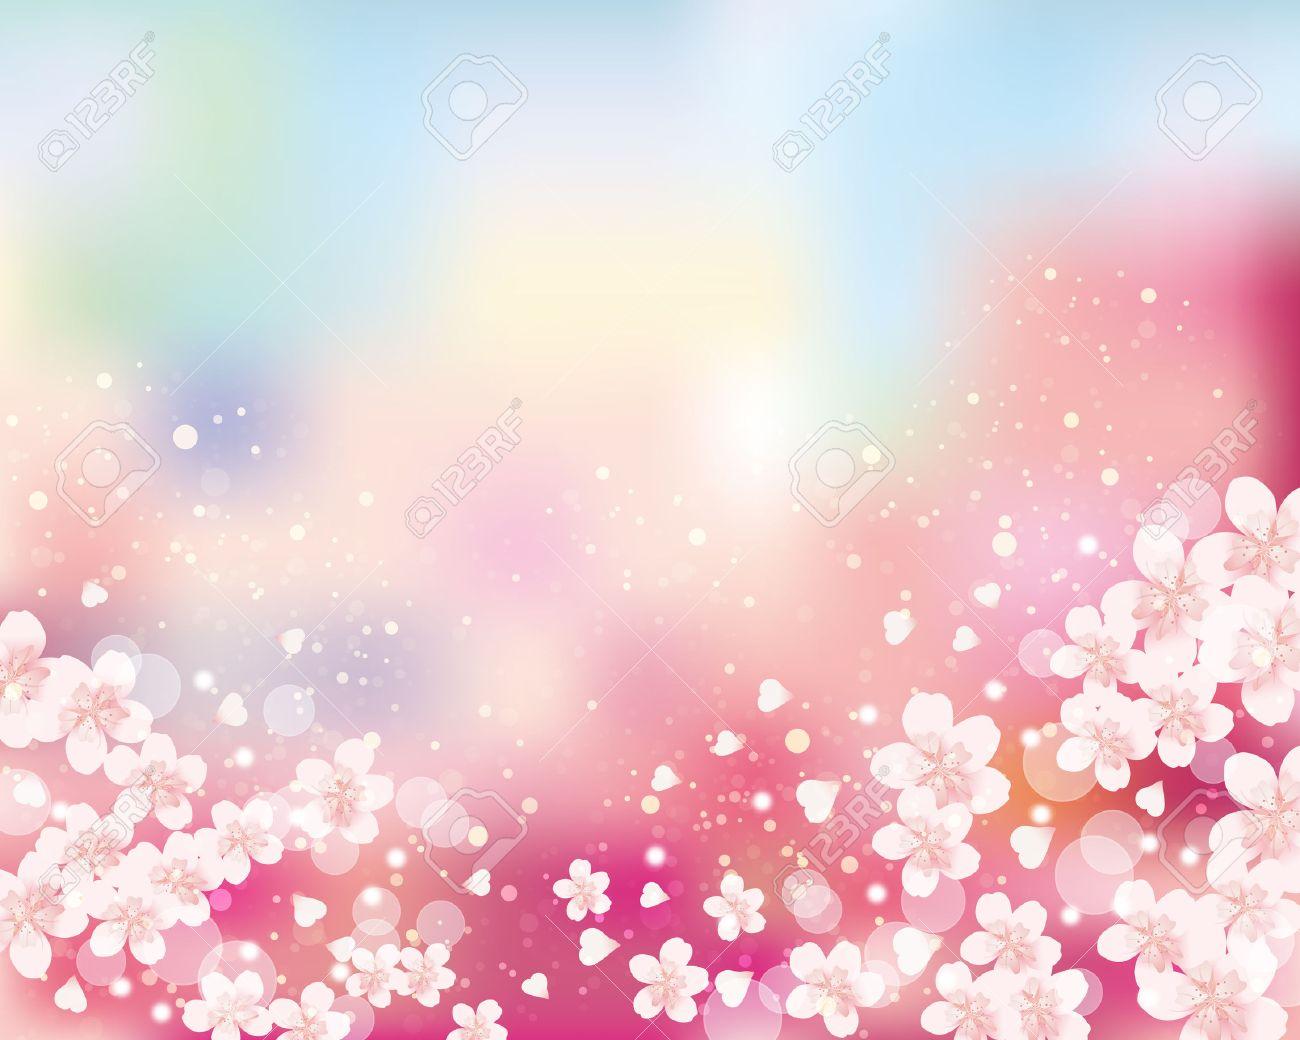 cherry blossom background - 53316828